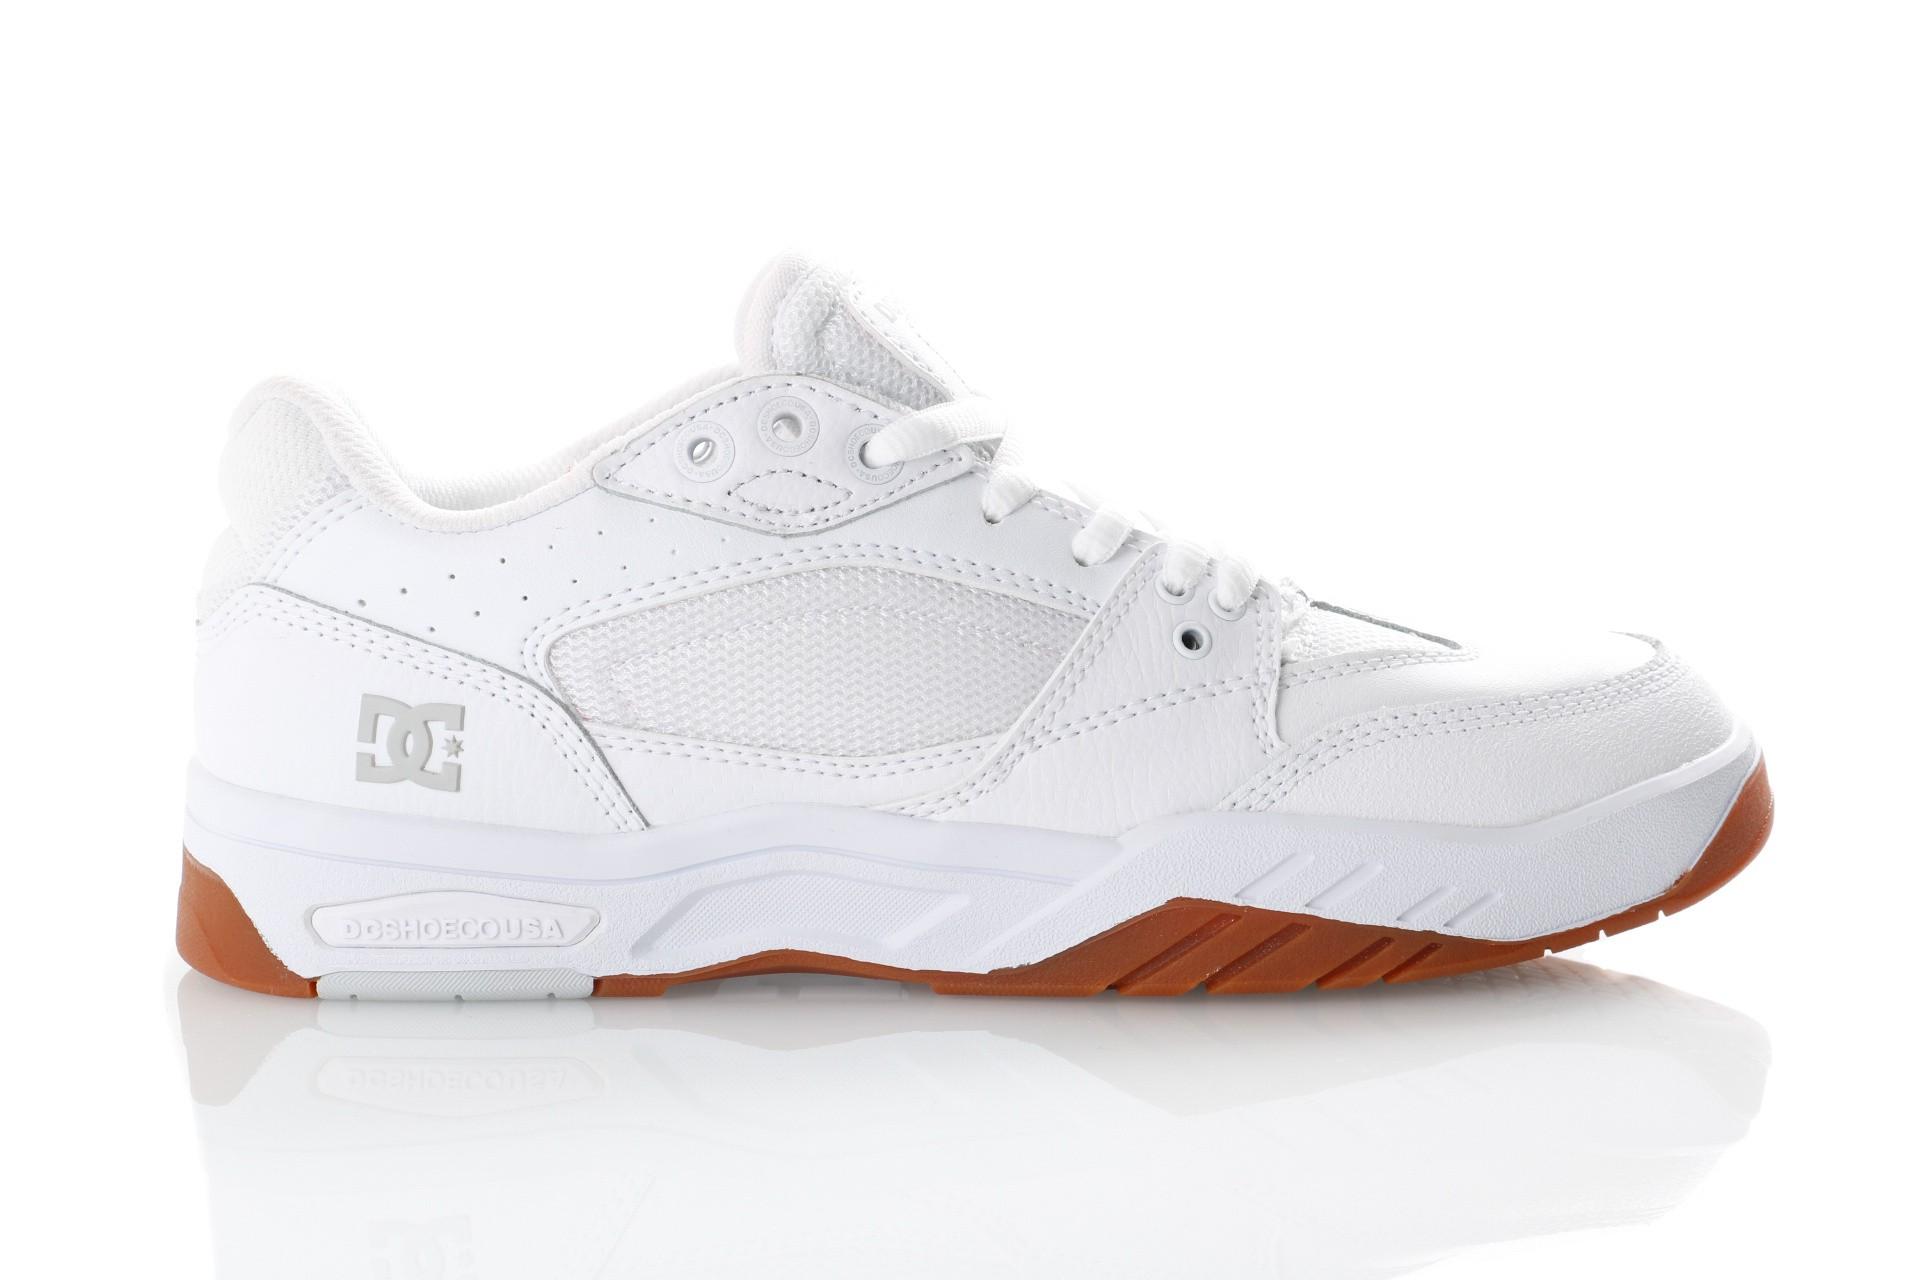 Foto van DC MASWELL M SHOE WG5 ADYS100473-WG5 Sneakers WHITE/GUM